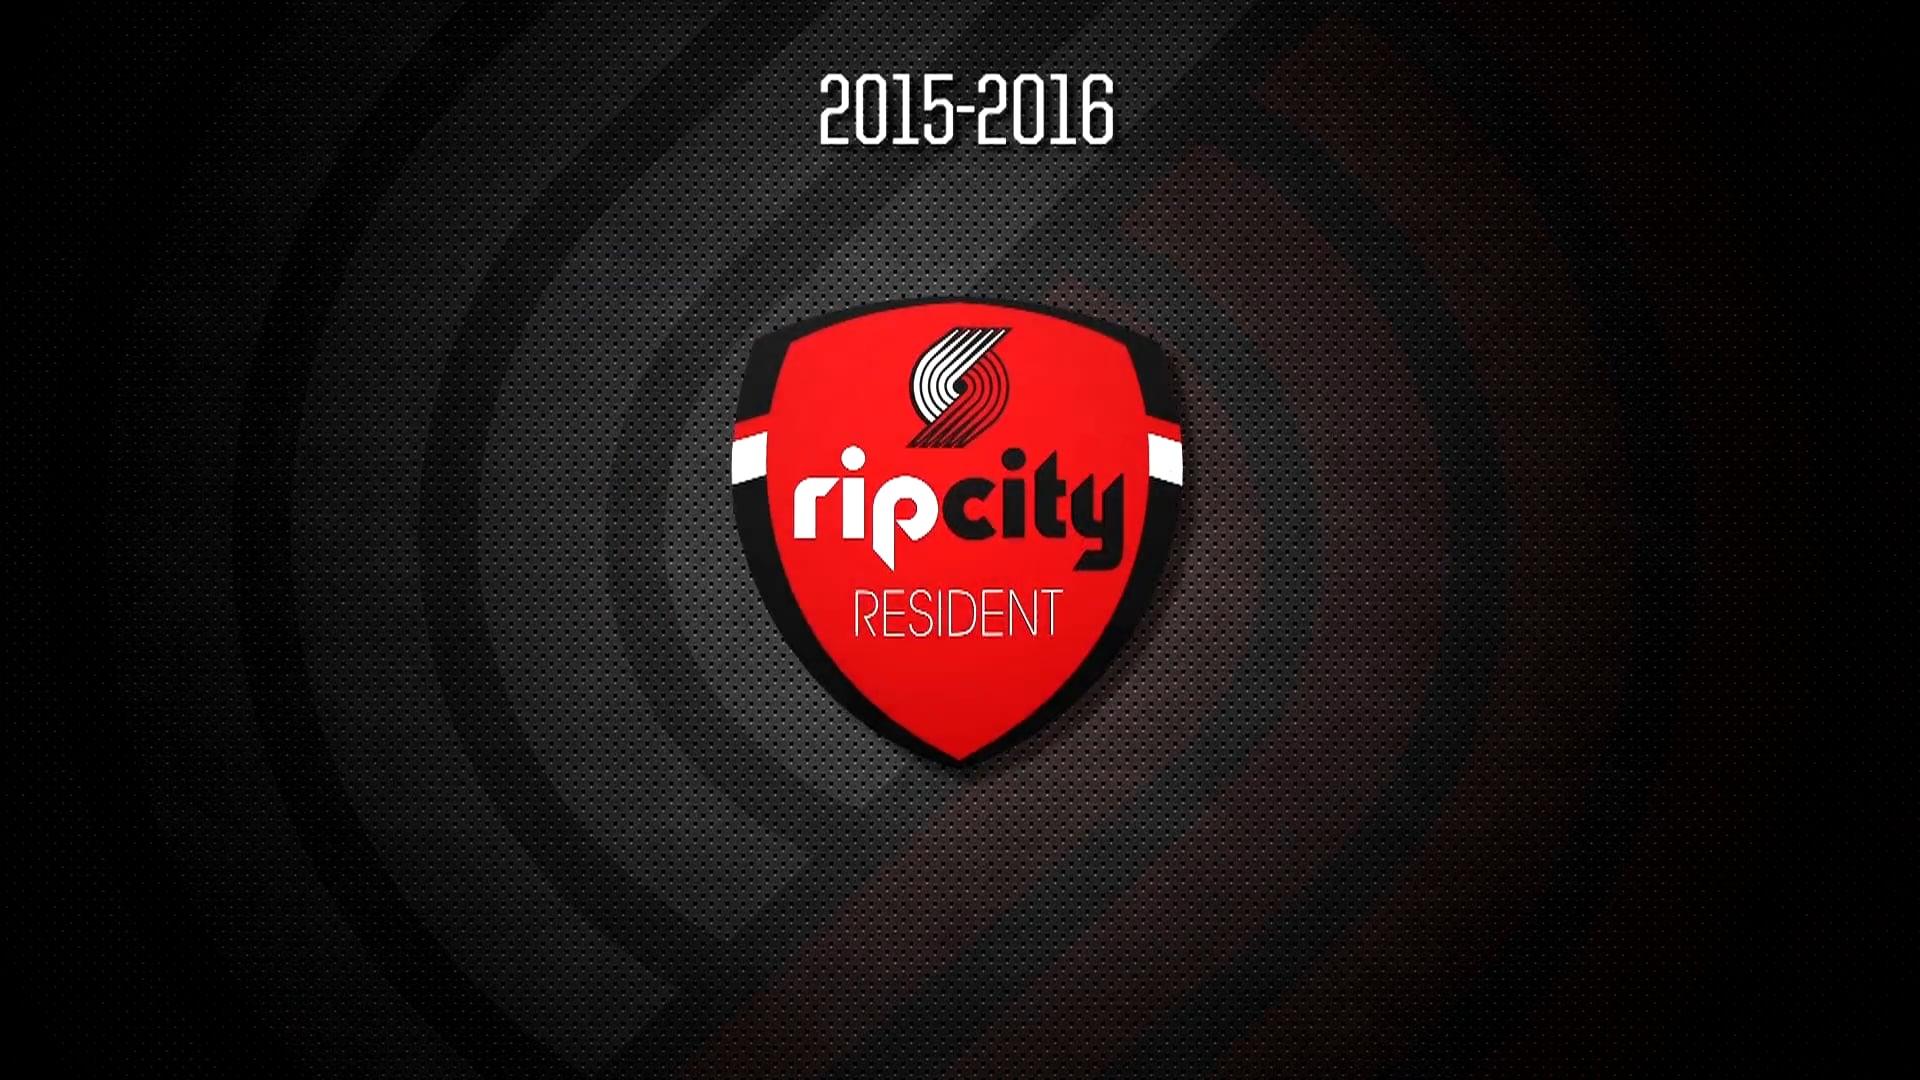 Rip City Resident 2015 Ad